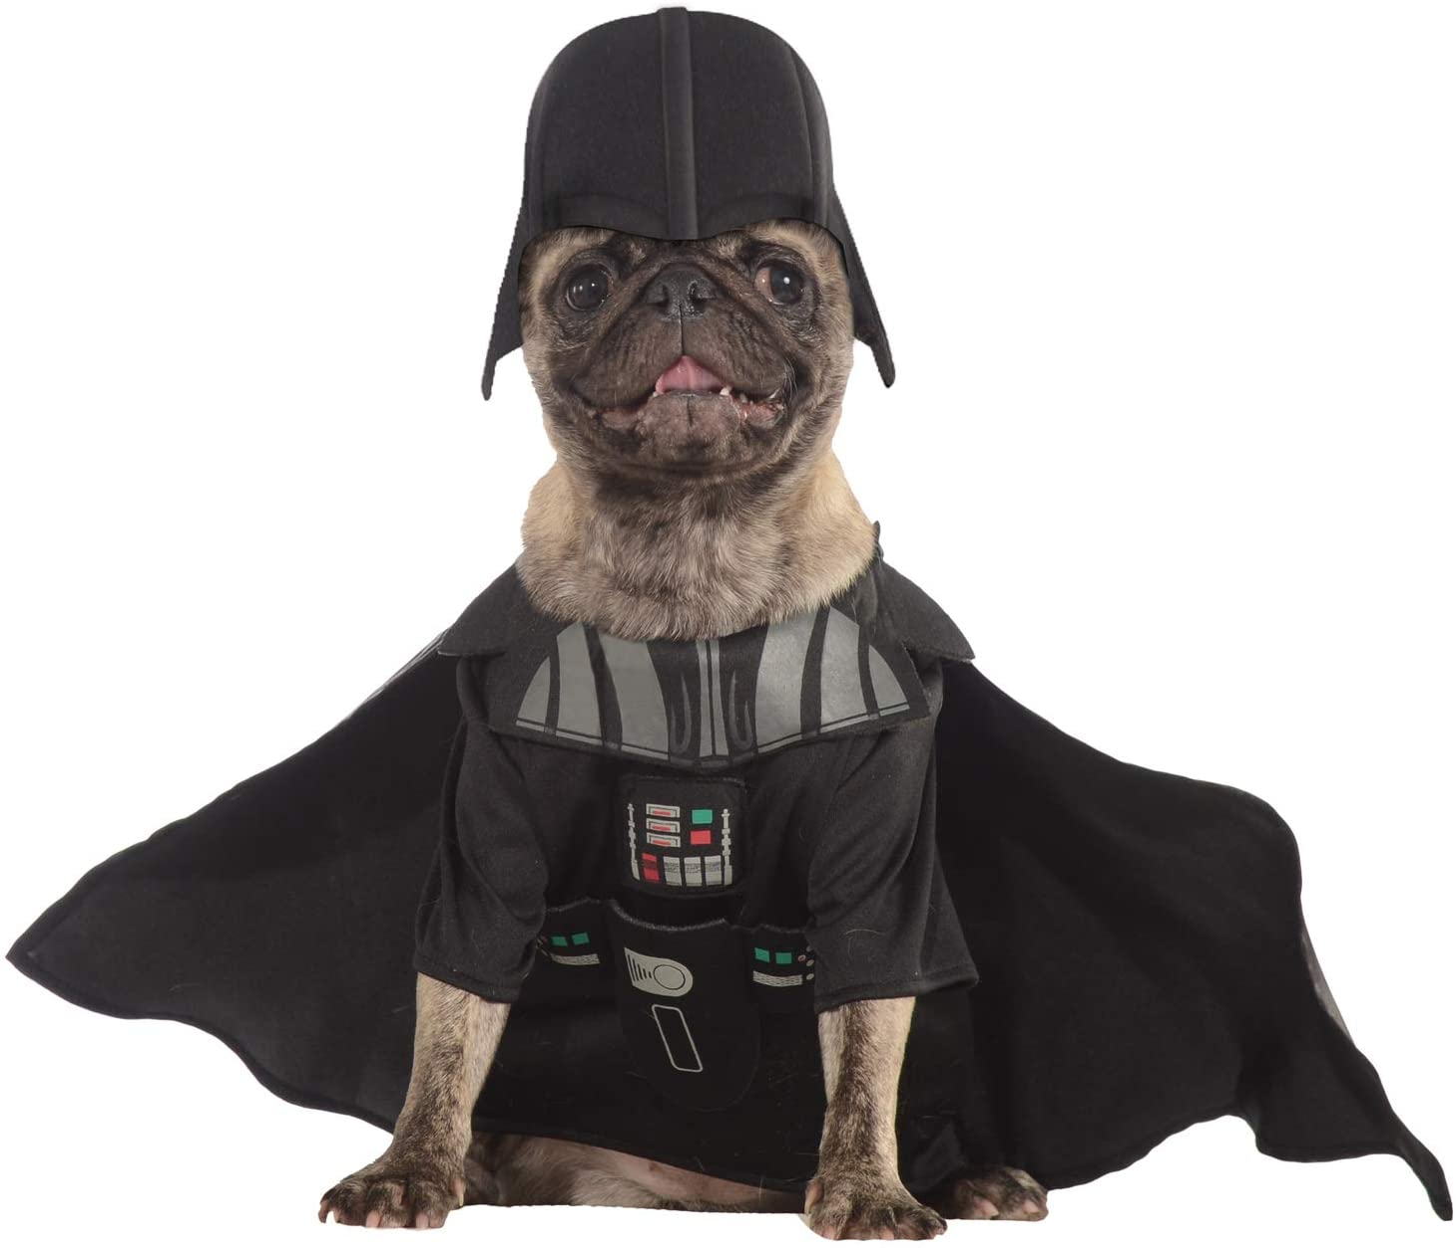 Star Wars - Disfraz de Darth Vader para mascota, Talla S perro (Rubie's 887852-S)